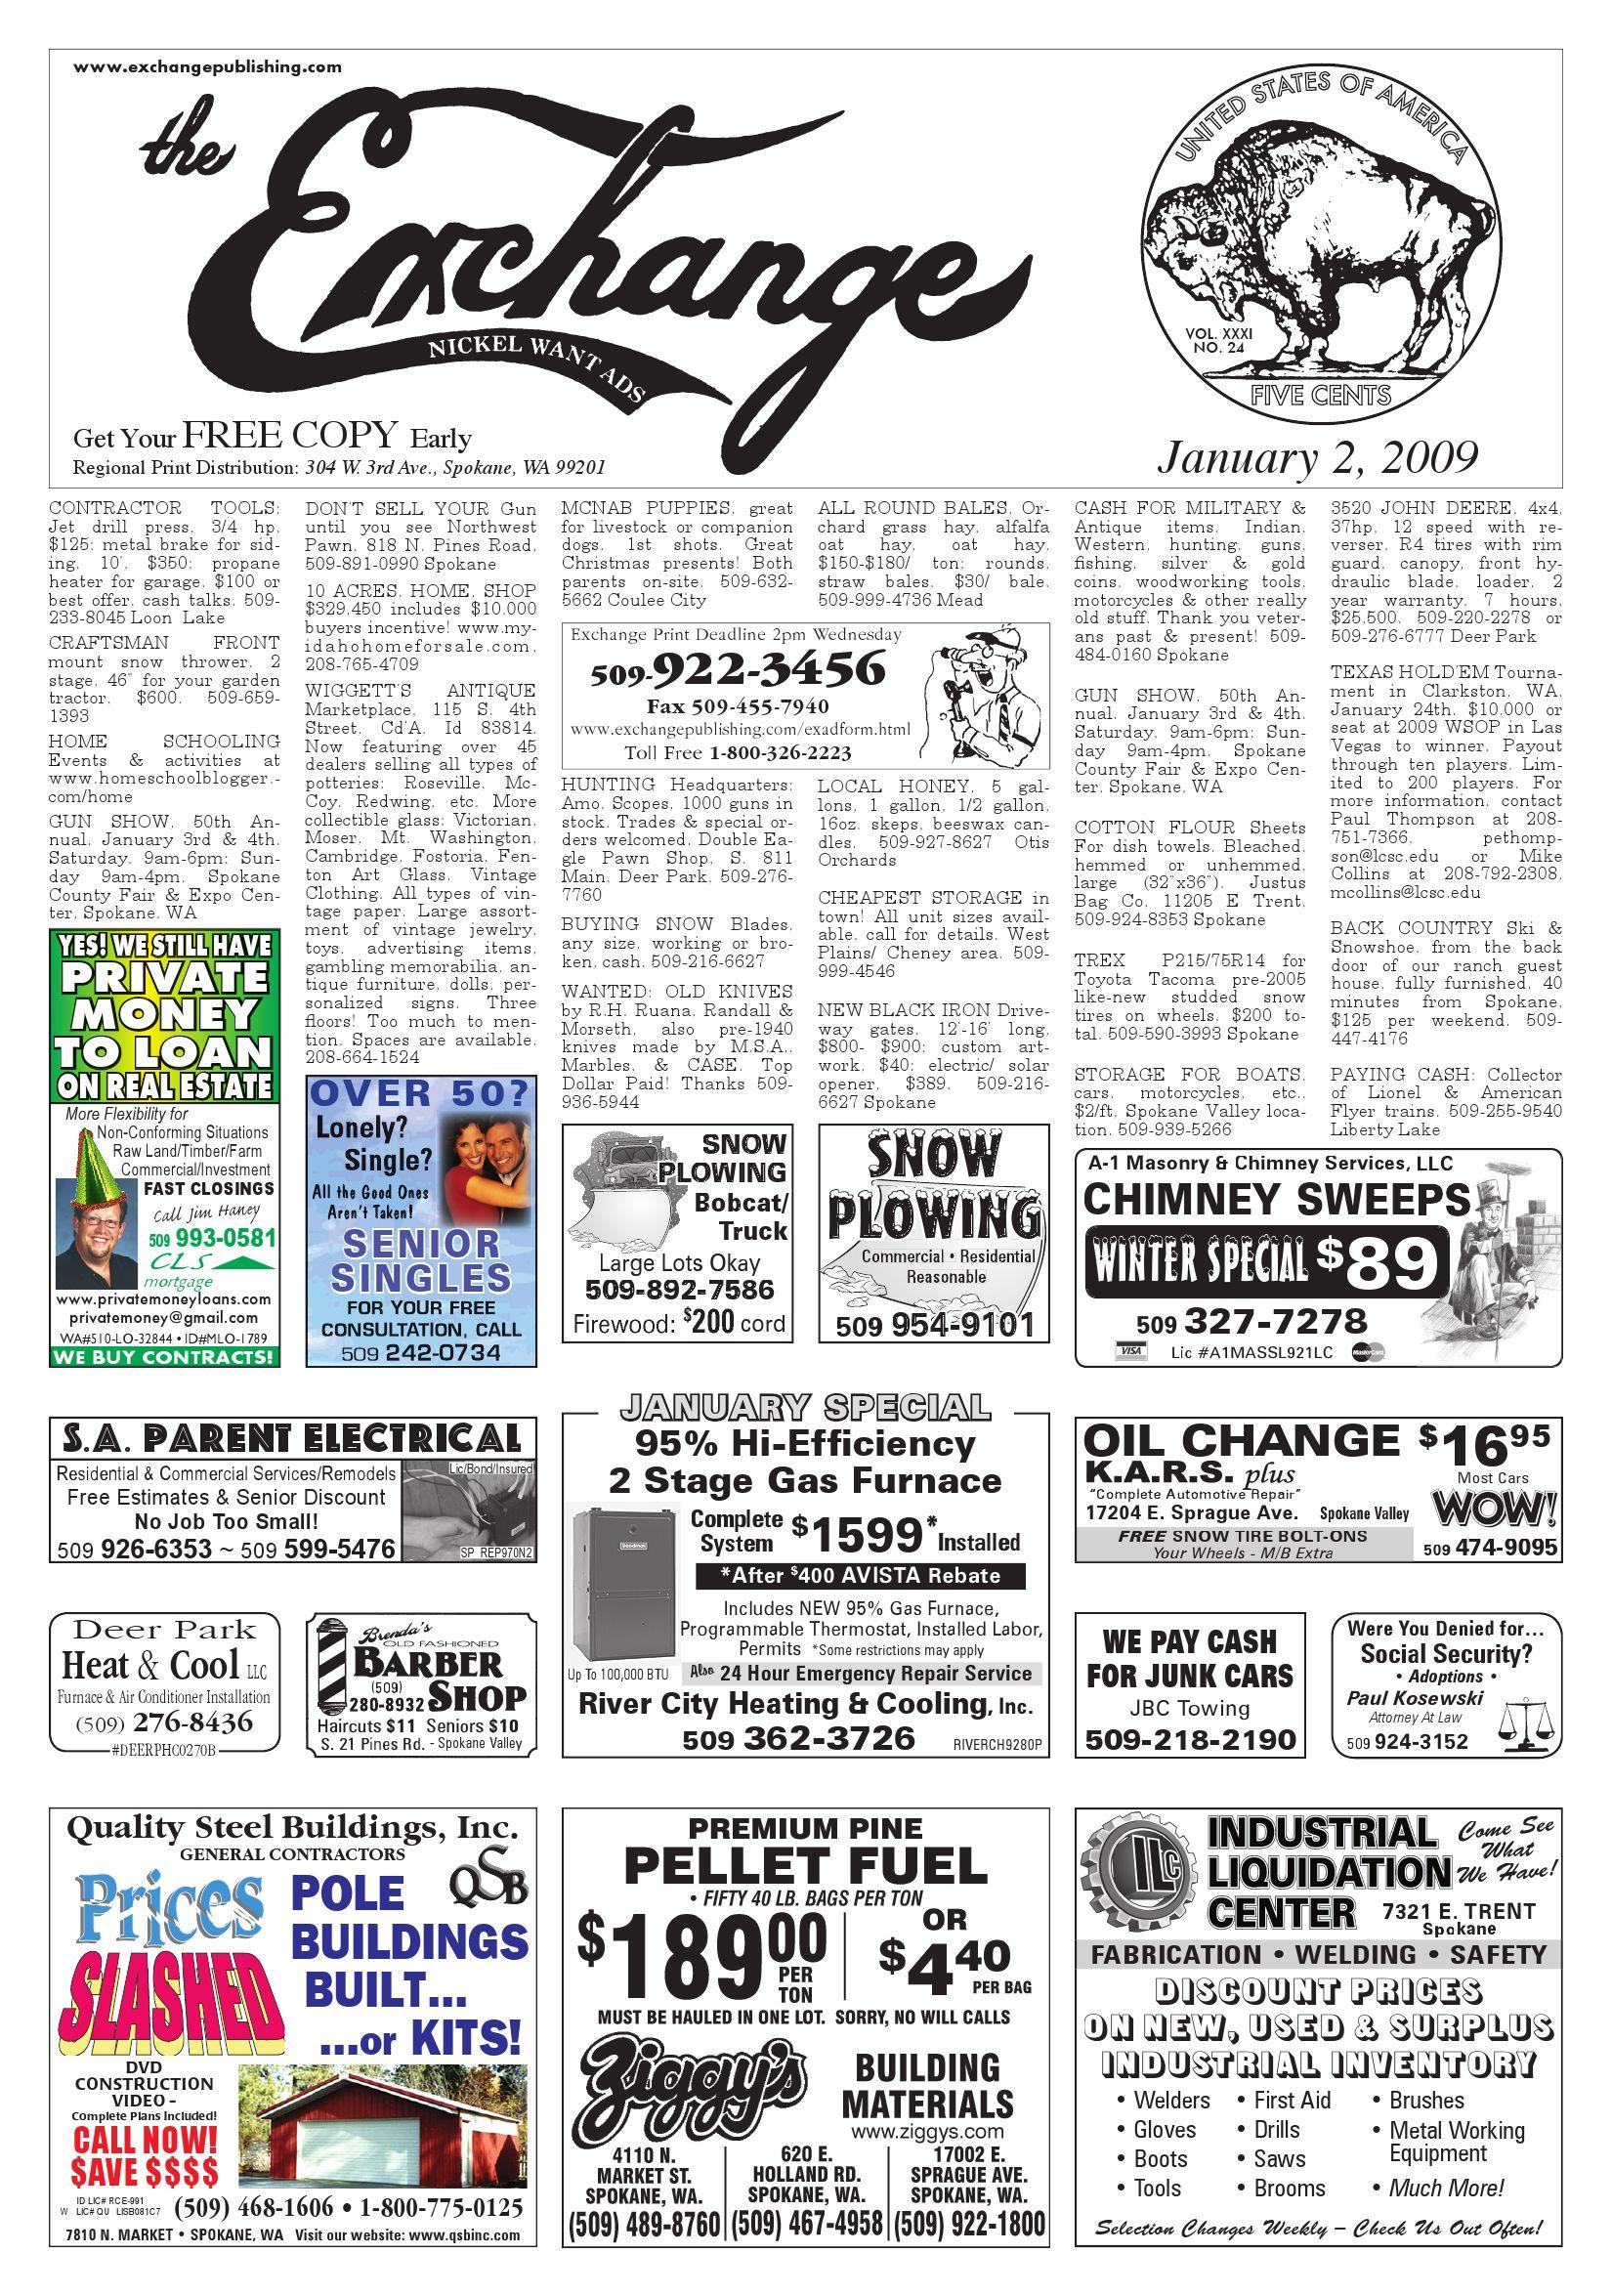 The Exchange - January 2, 2009 by Exchange Publishing - issuu